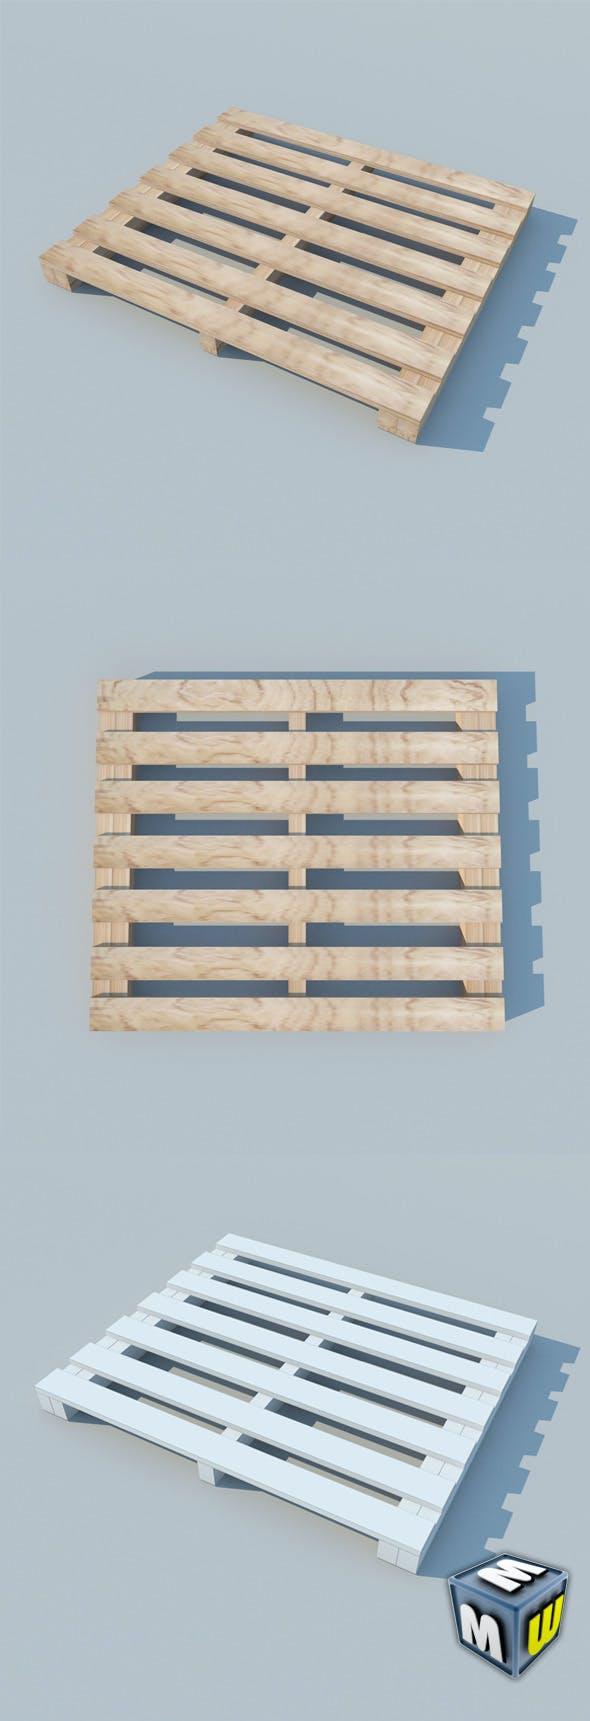 Wood Pallet 2 MAX 2011 - 3DOcean Item for Sale